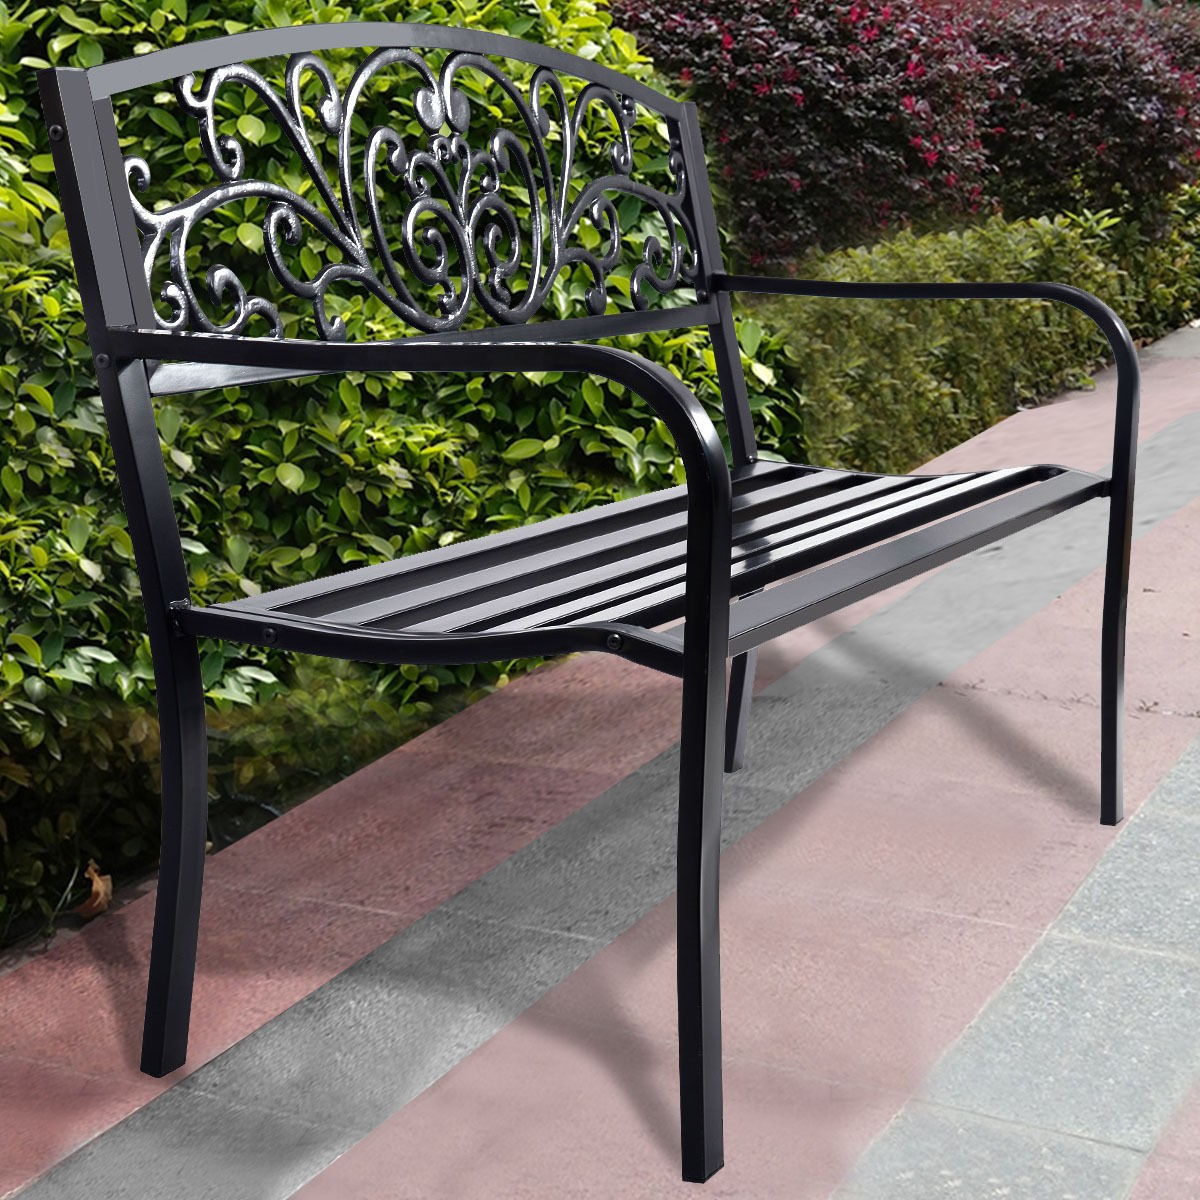 Black Patio Bench 2 Seat Outdoor Lawn & Garden Decoration